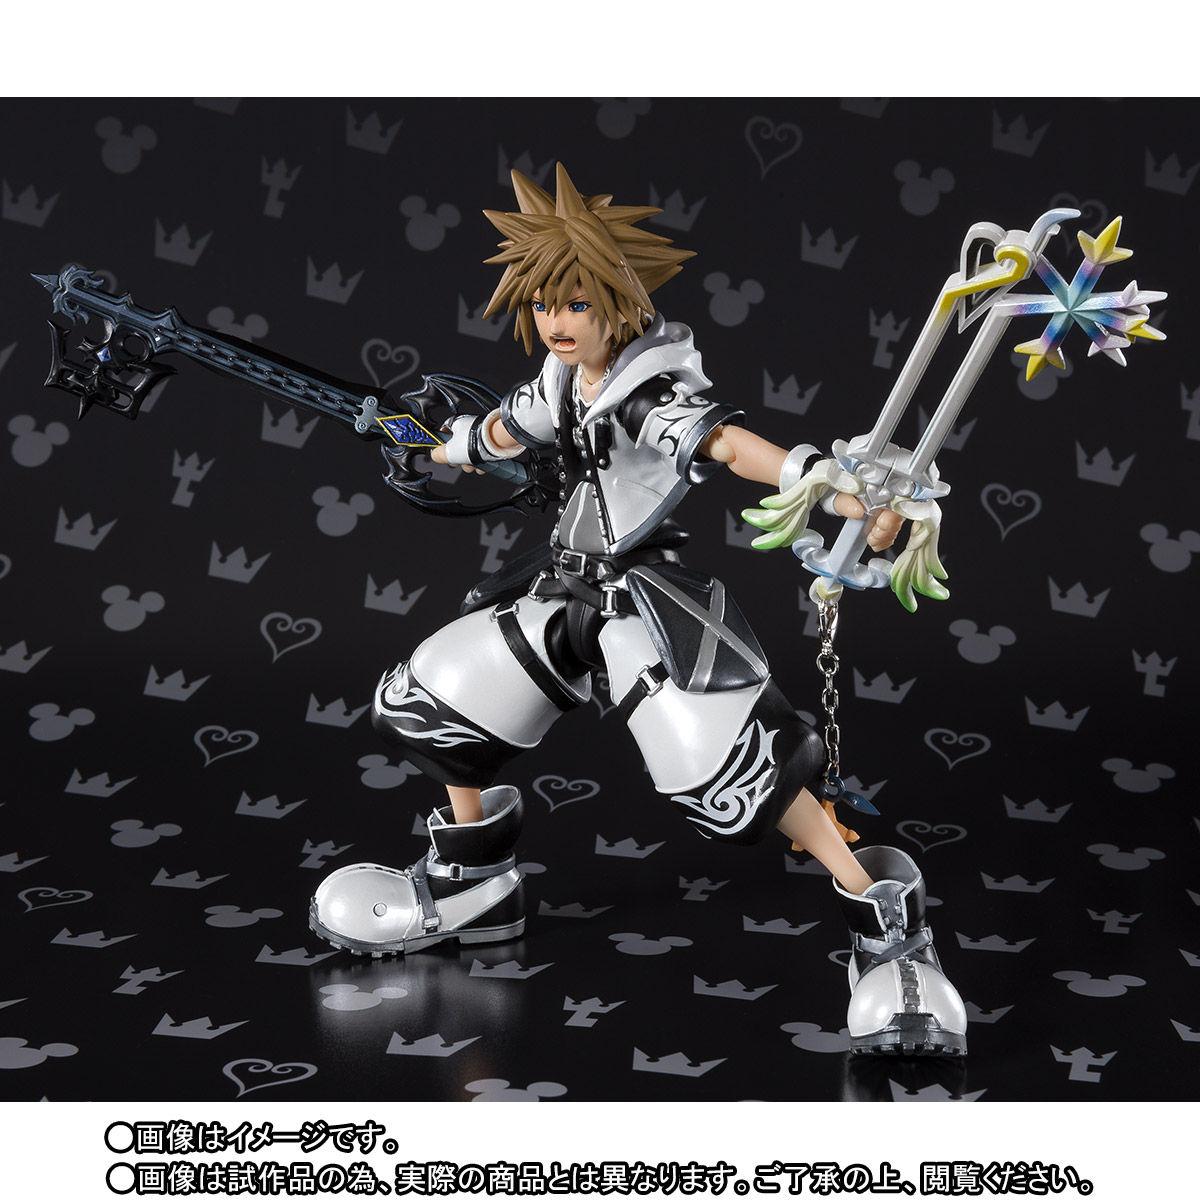 Sora Kingdom Hearts 1520074: Kingdom Hearts 2 Sora Final Form SH Figuarts Coming Soon